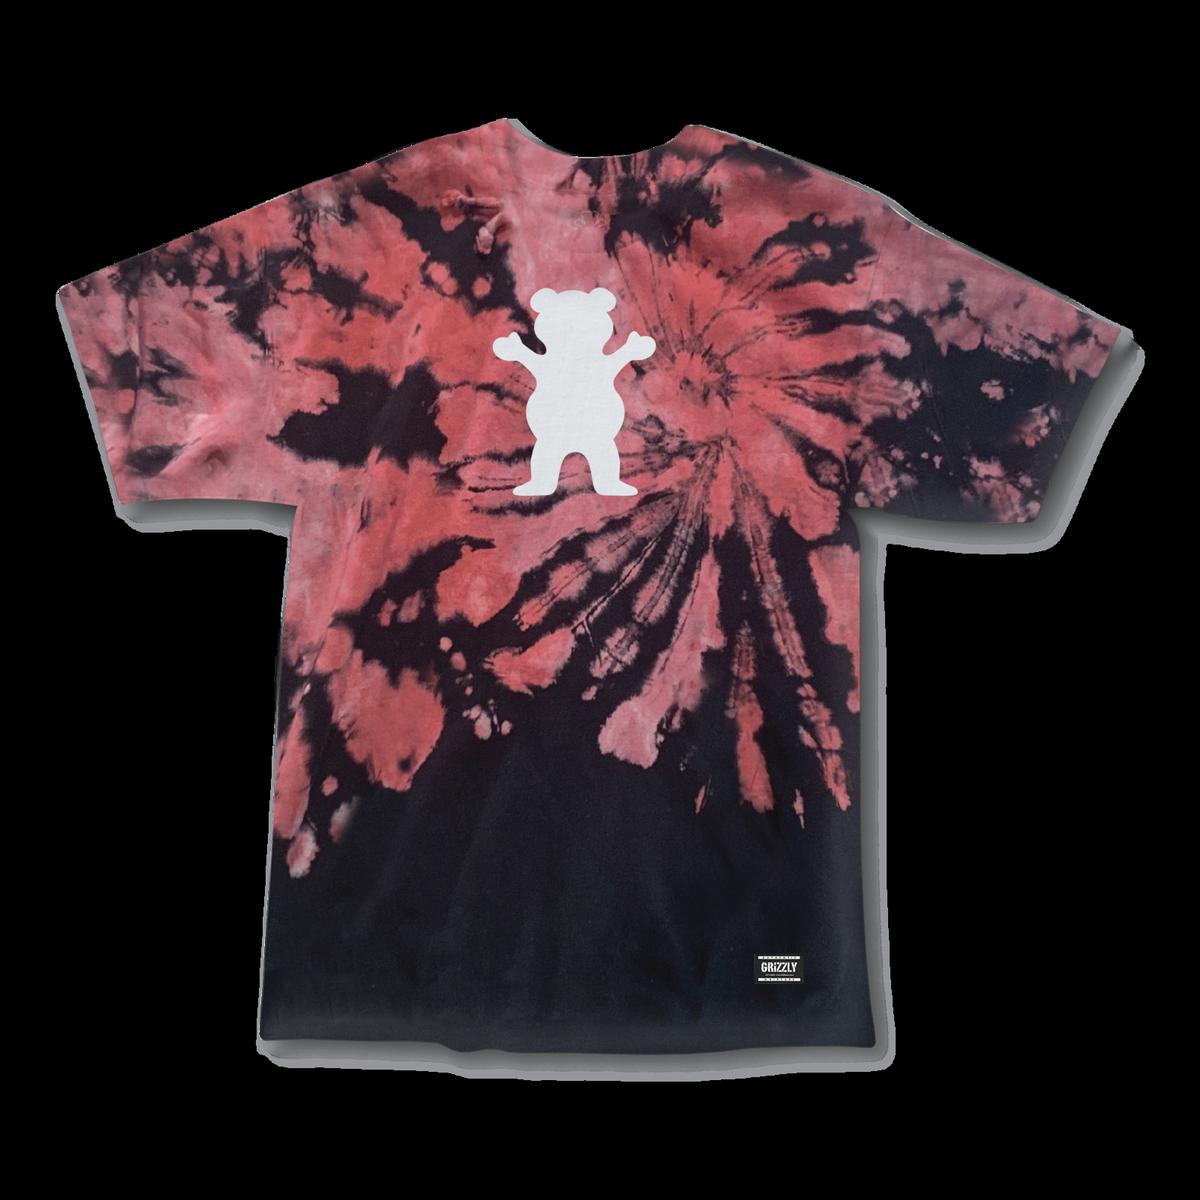 Hoodie T shirt Adidas Originals Bluza, T shirt free png